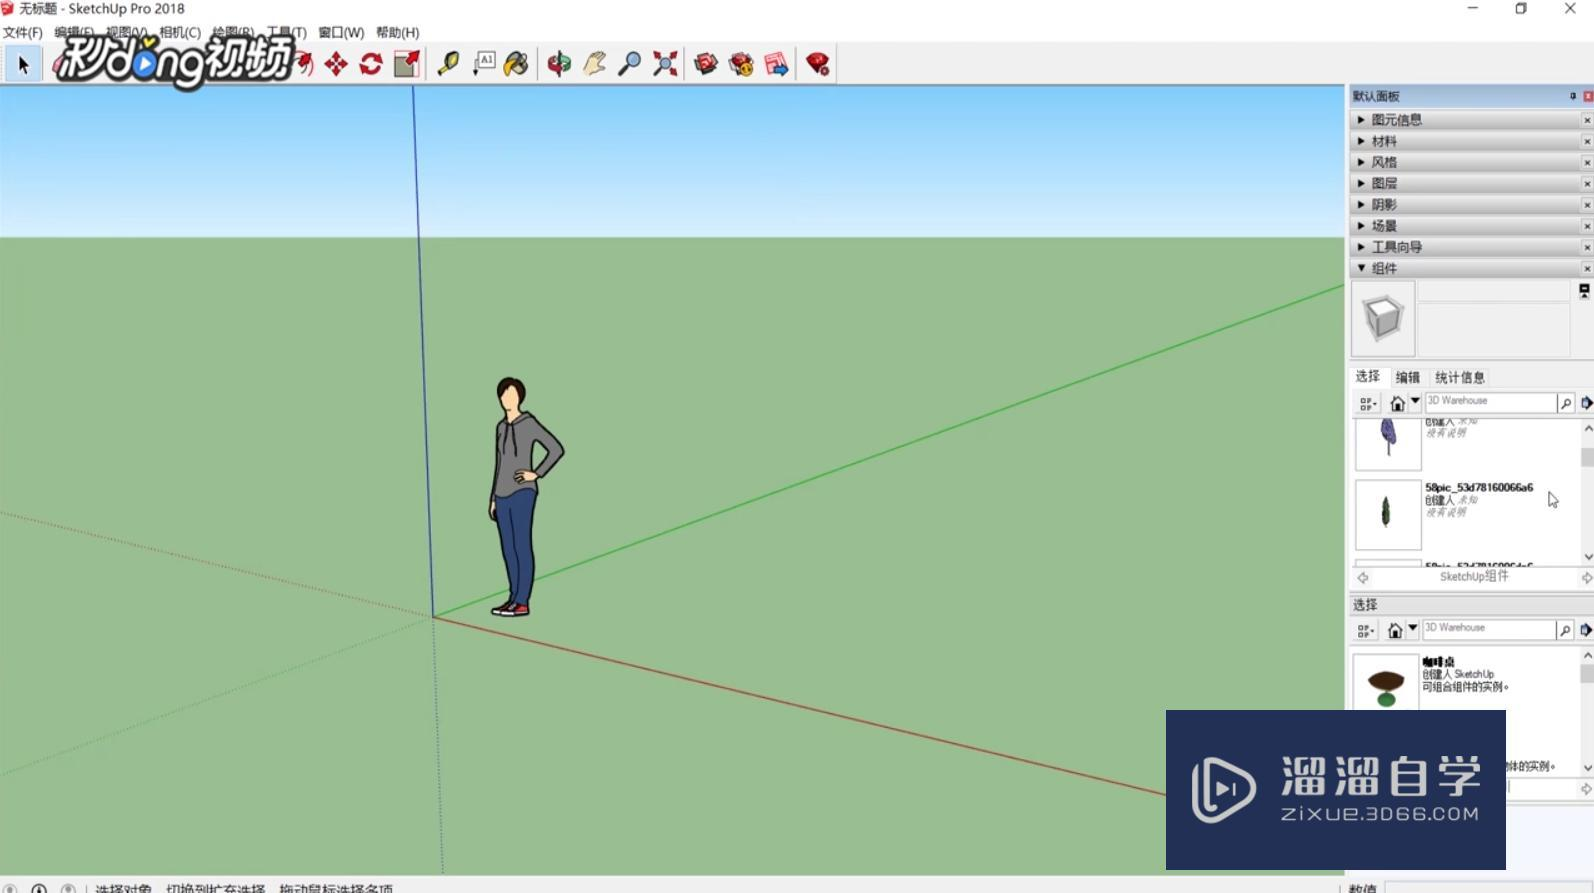 SketchUp中如何调用外部组件?